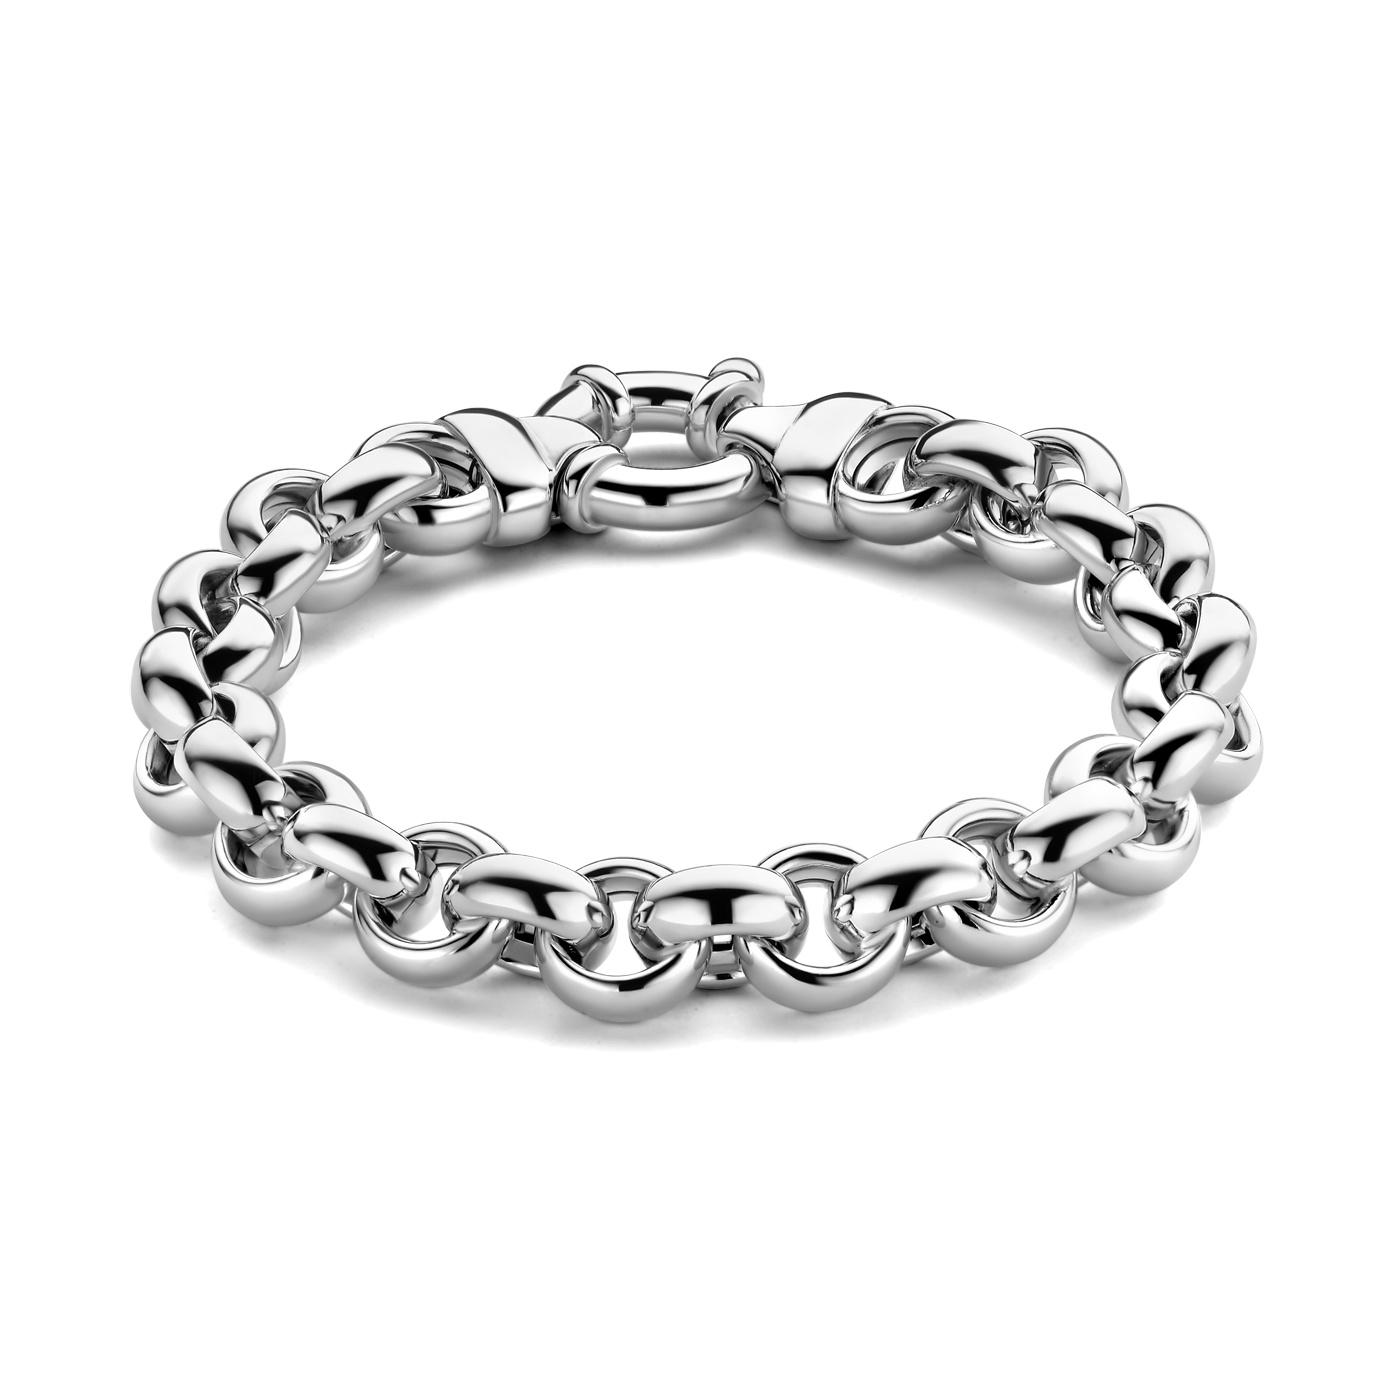 Parte di Me Bibbiena Poppi San Fedele 925 Sterling Silber Armband